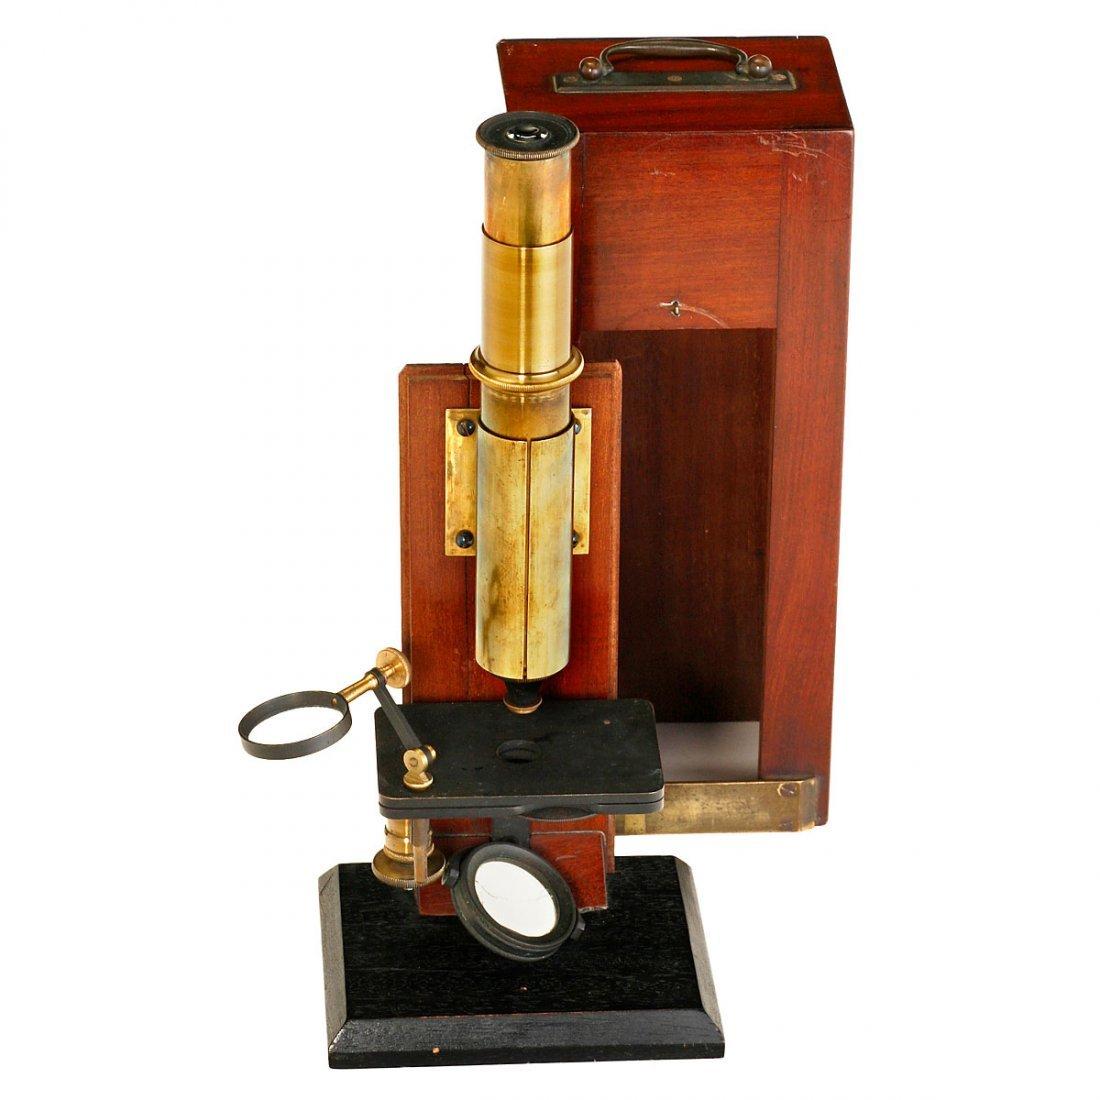 Brass Compound Microscope, c. 1860